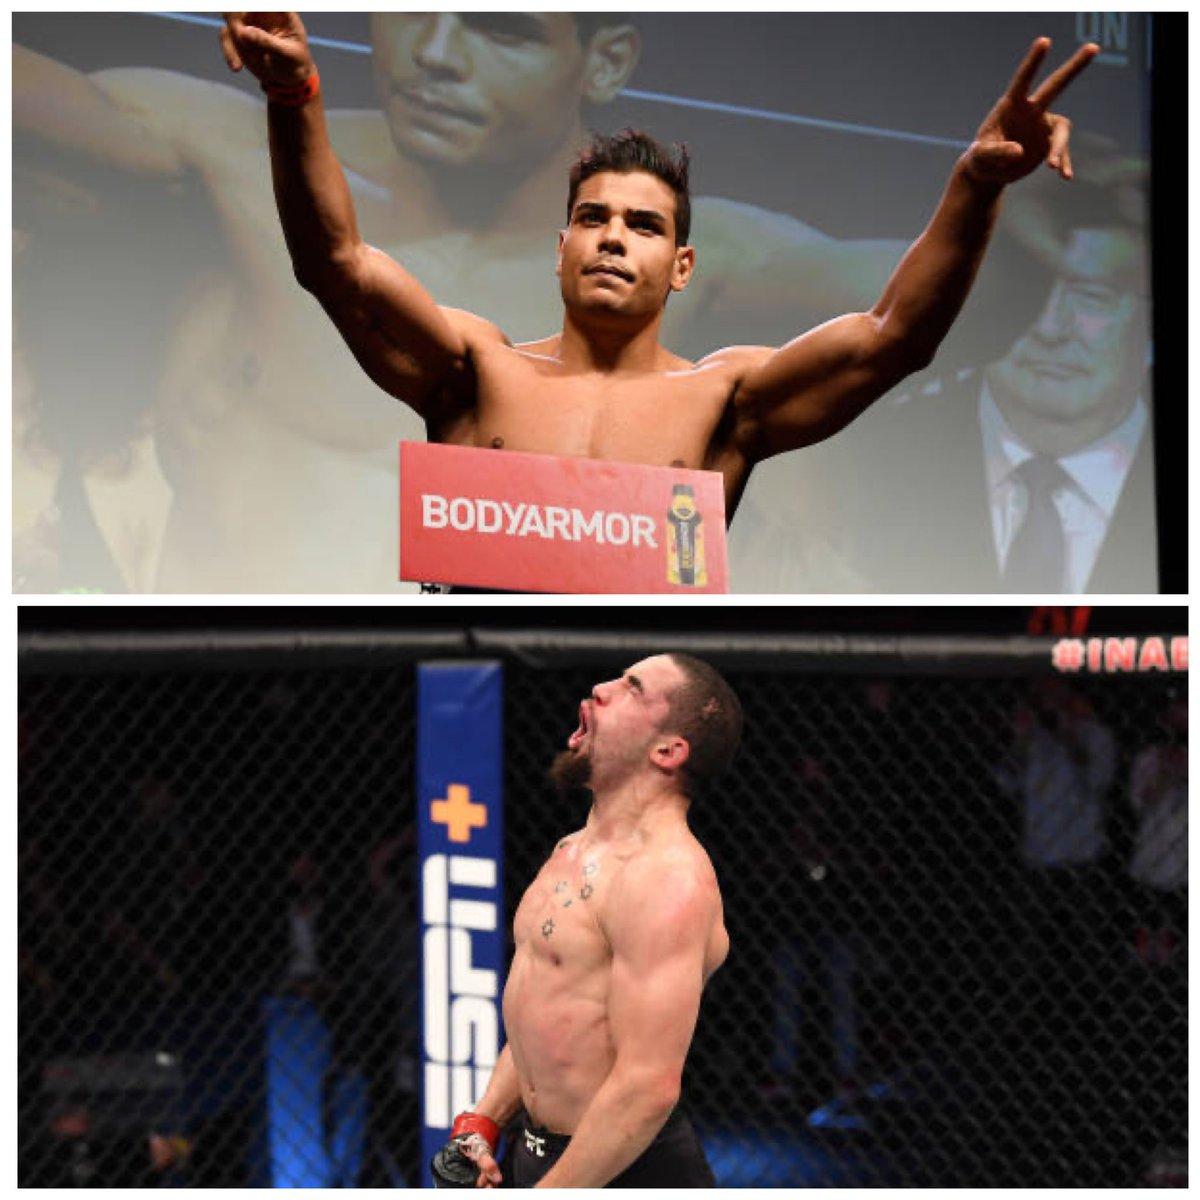 UFC officials confirm, Robert Whittaker (@robwhittakermma) vs. Paulo Costa (@BorrachinhaMMA) will headline an event on April 17. Five rounds. How good is this? https://t.co/mexXsiqWuF